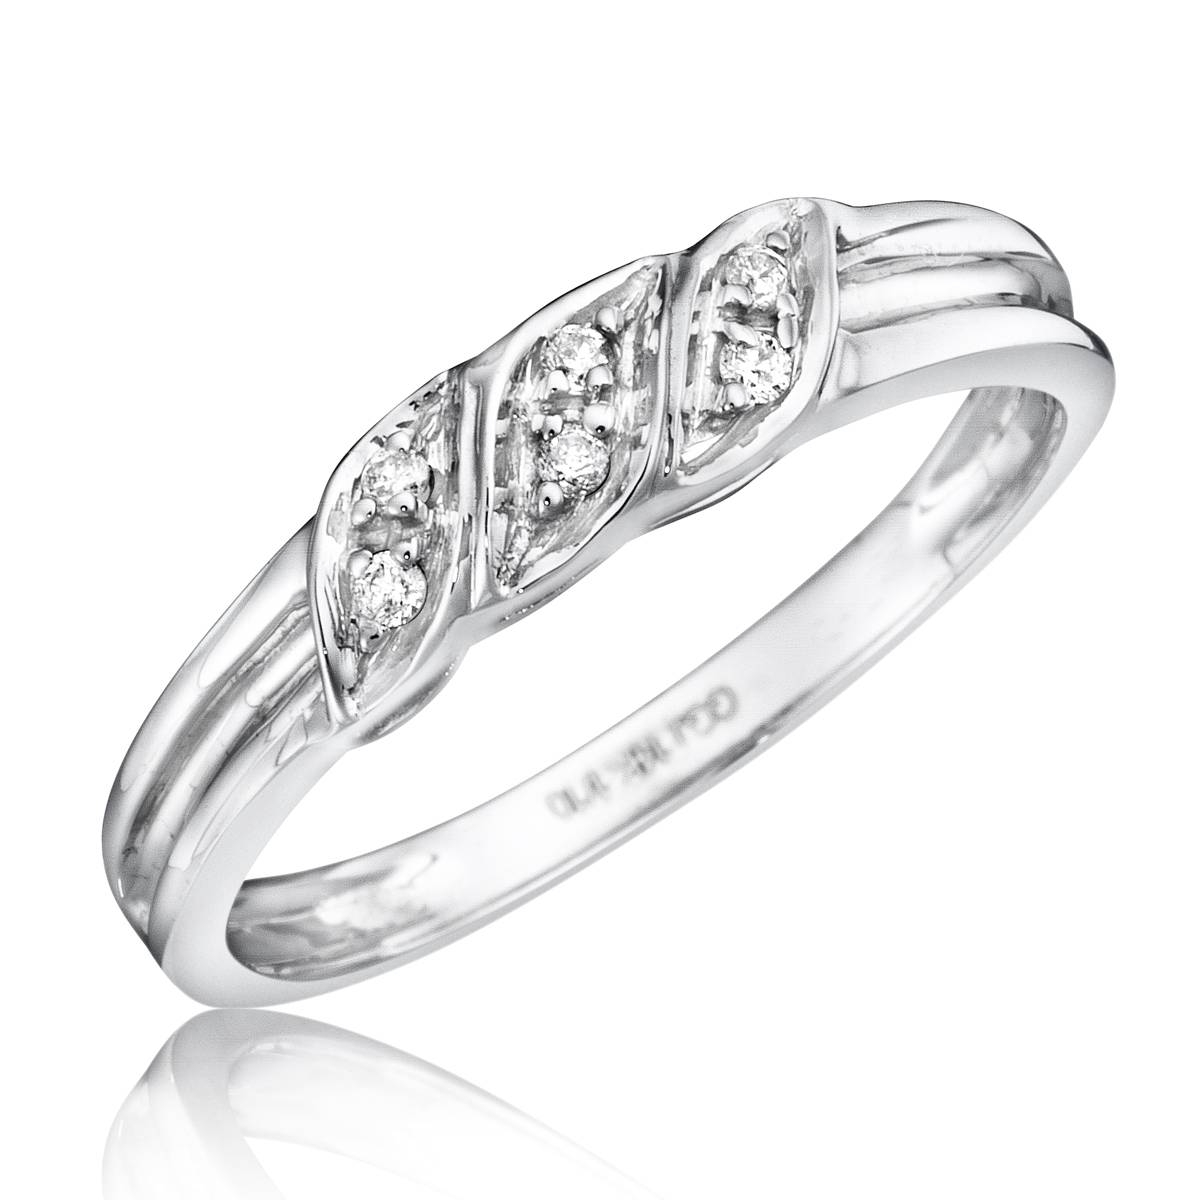 1/15 Carat T.w. Diamond Women's Wedding Ring 10K White Gold Regarding Womens White Gold Wedding Bands (Gallery 9 of 15)